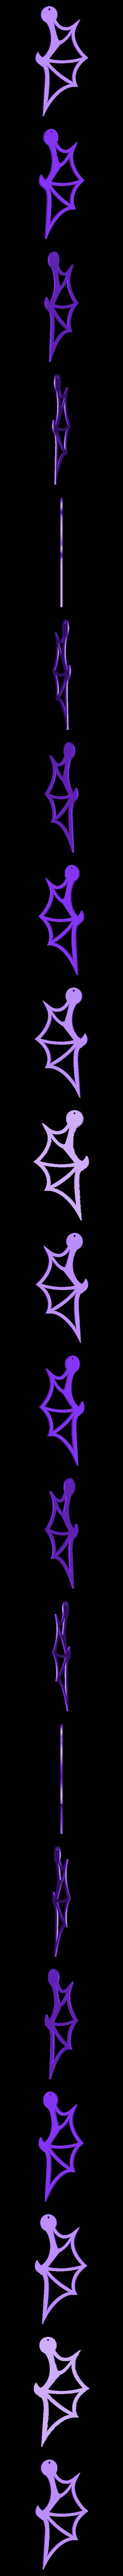 wingTopAndBottom_make2.stl Download free STL file Dragon Wings • 3D print object, LordTailor